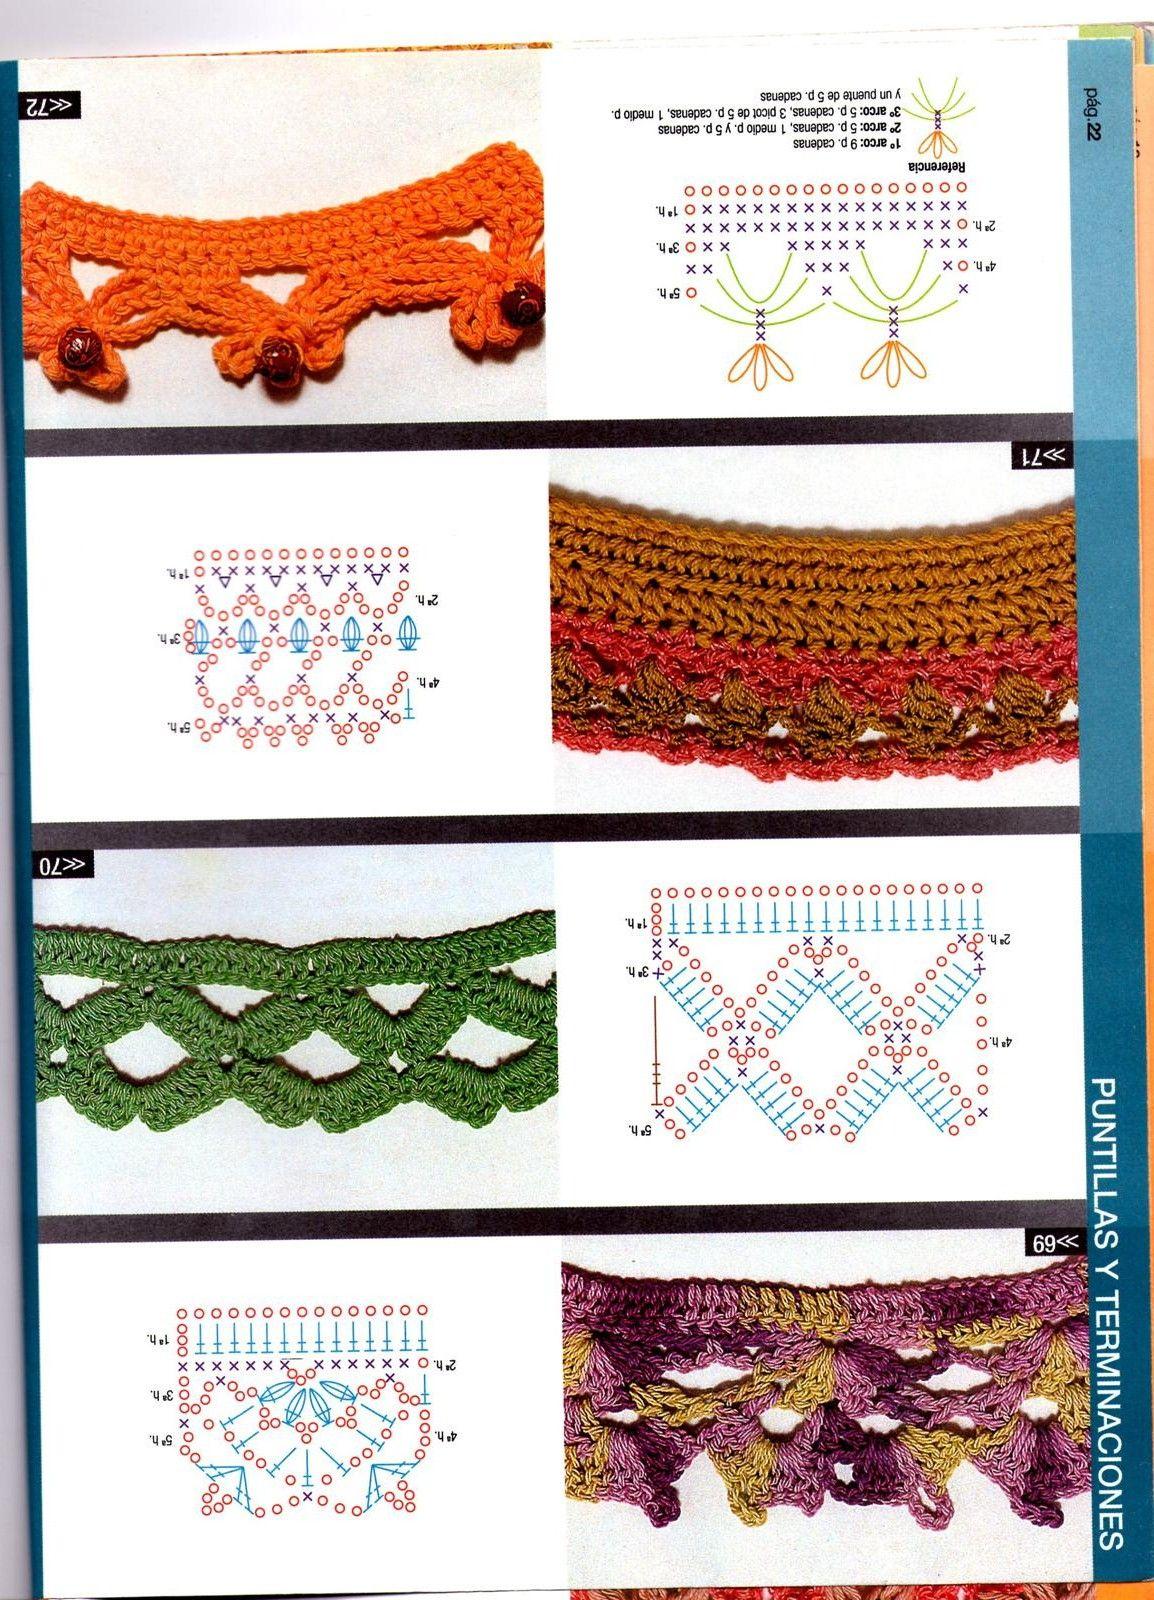 crochet #pattern #patterns #knit #puntos #stitches | C r o c h e t ...